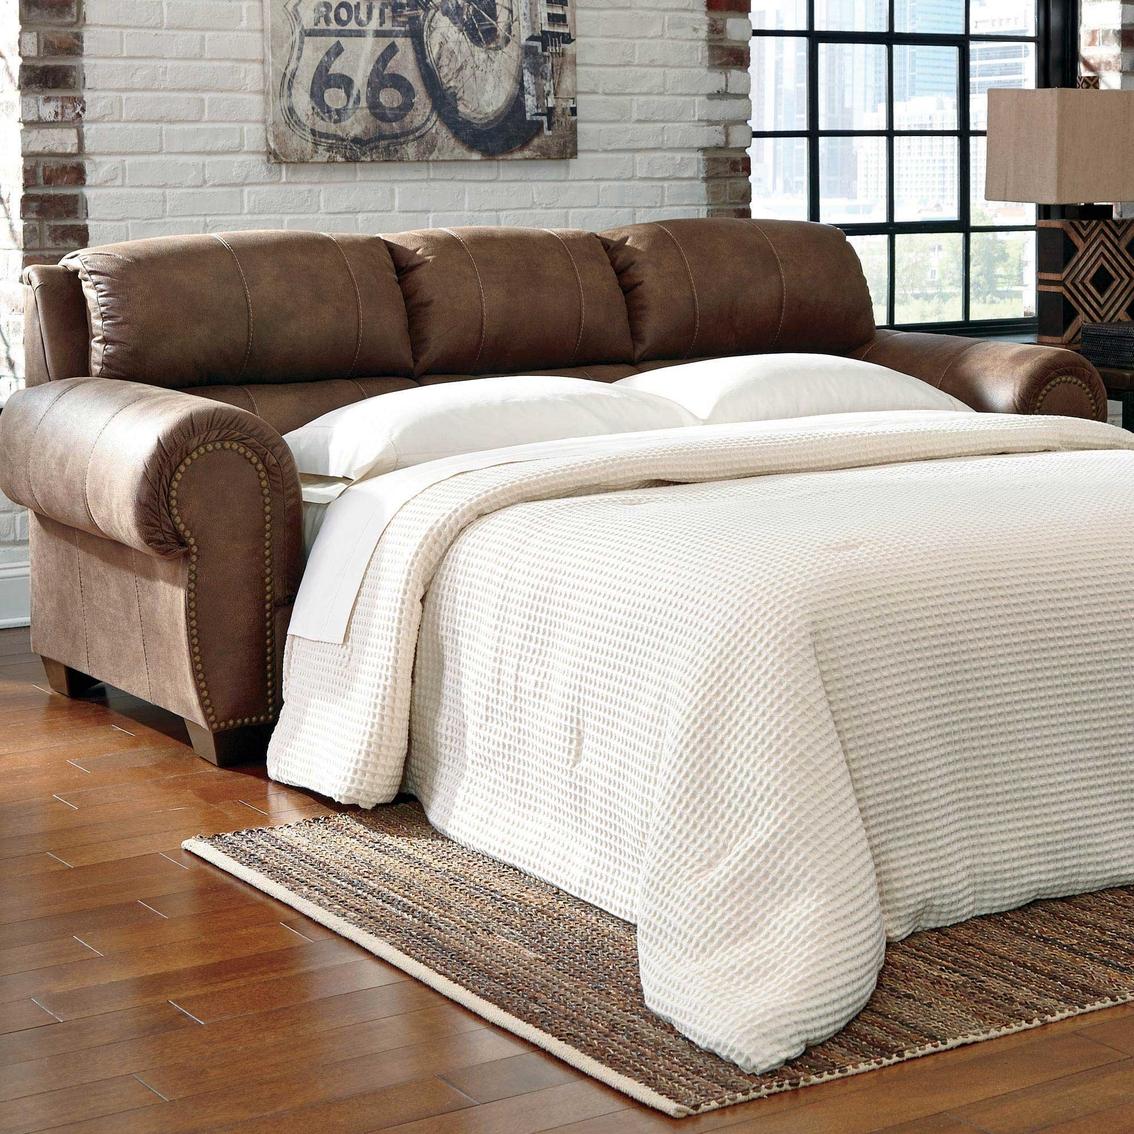 Benchcraft Burnsville Queen Sofa Sleeper Sofas Couches Home Appliances Shop The Exchange